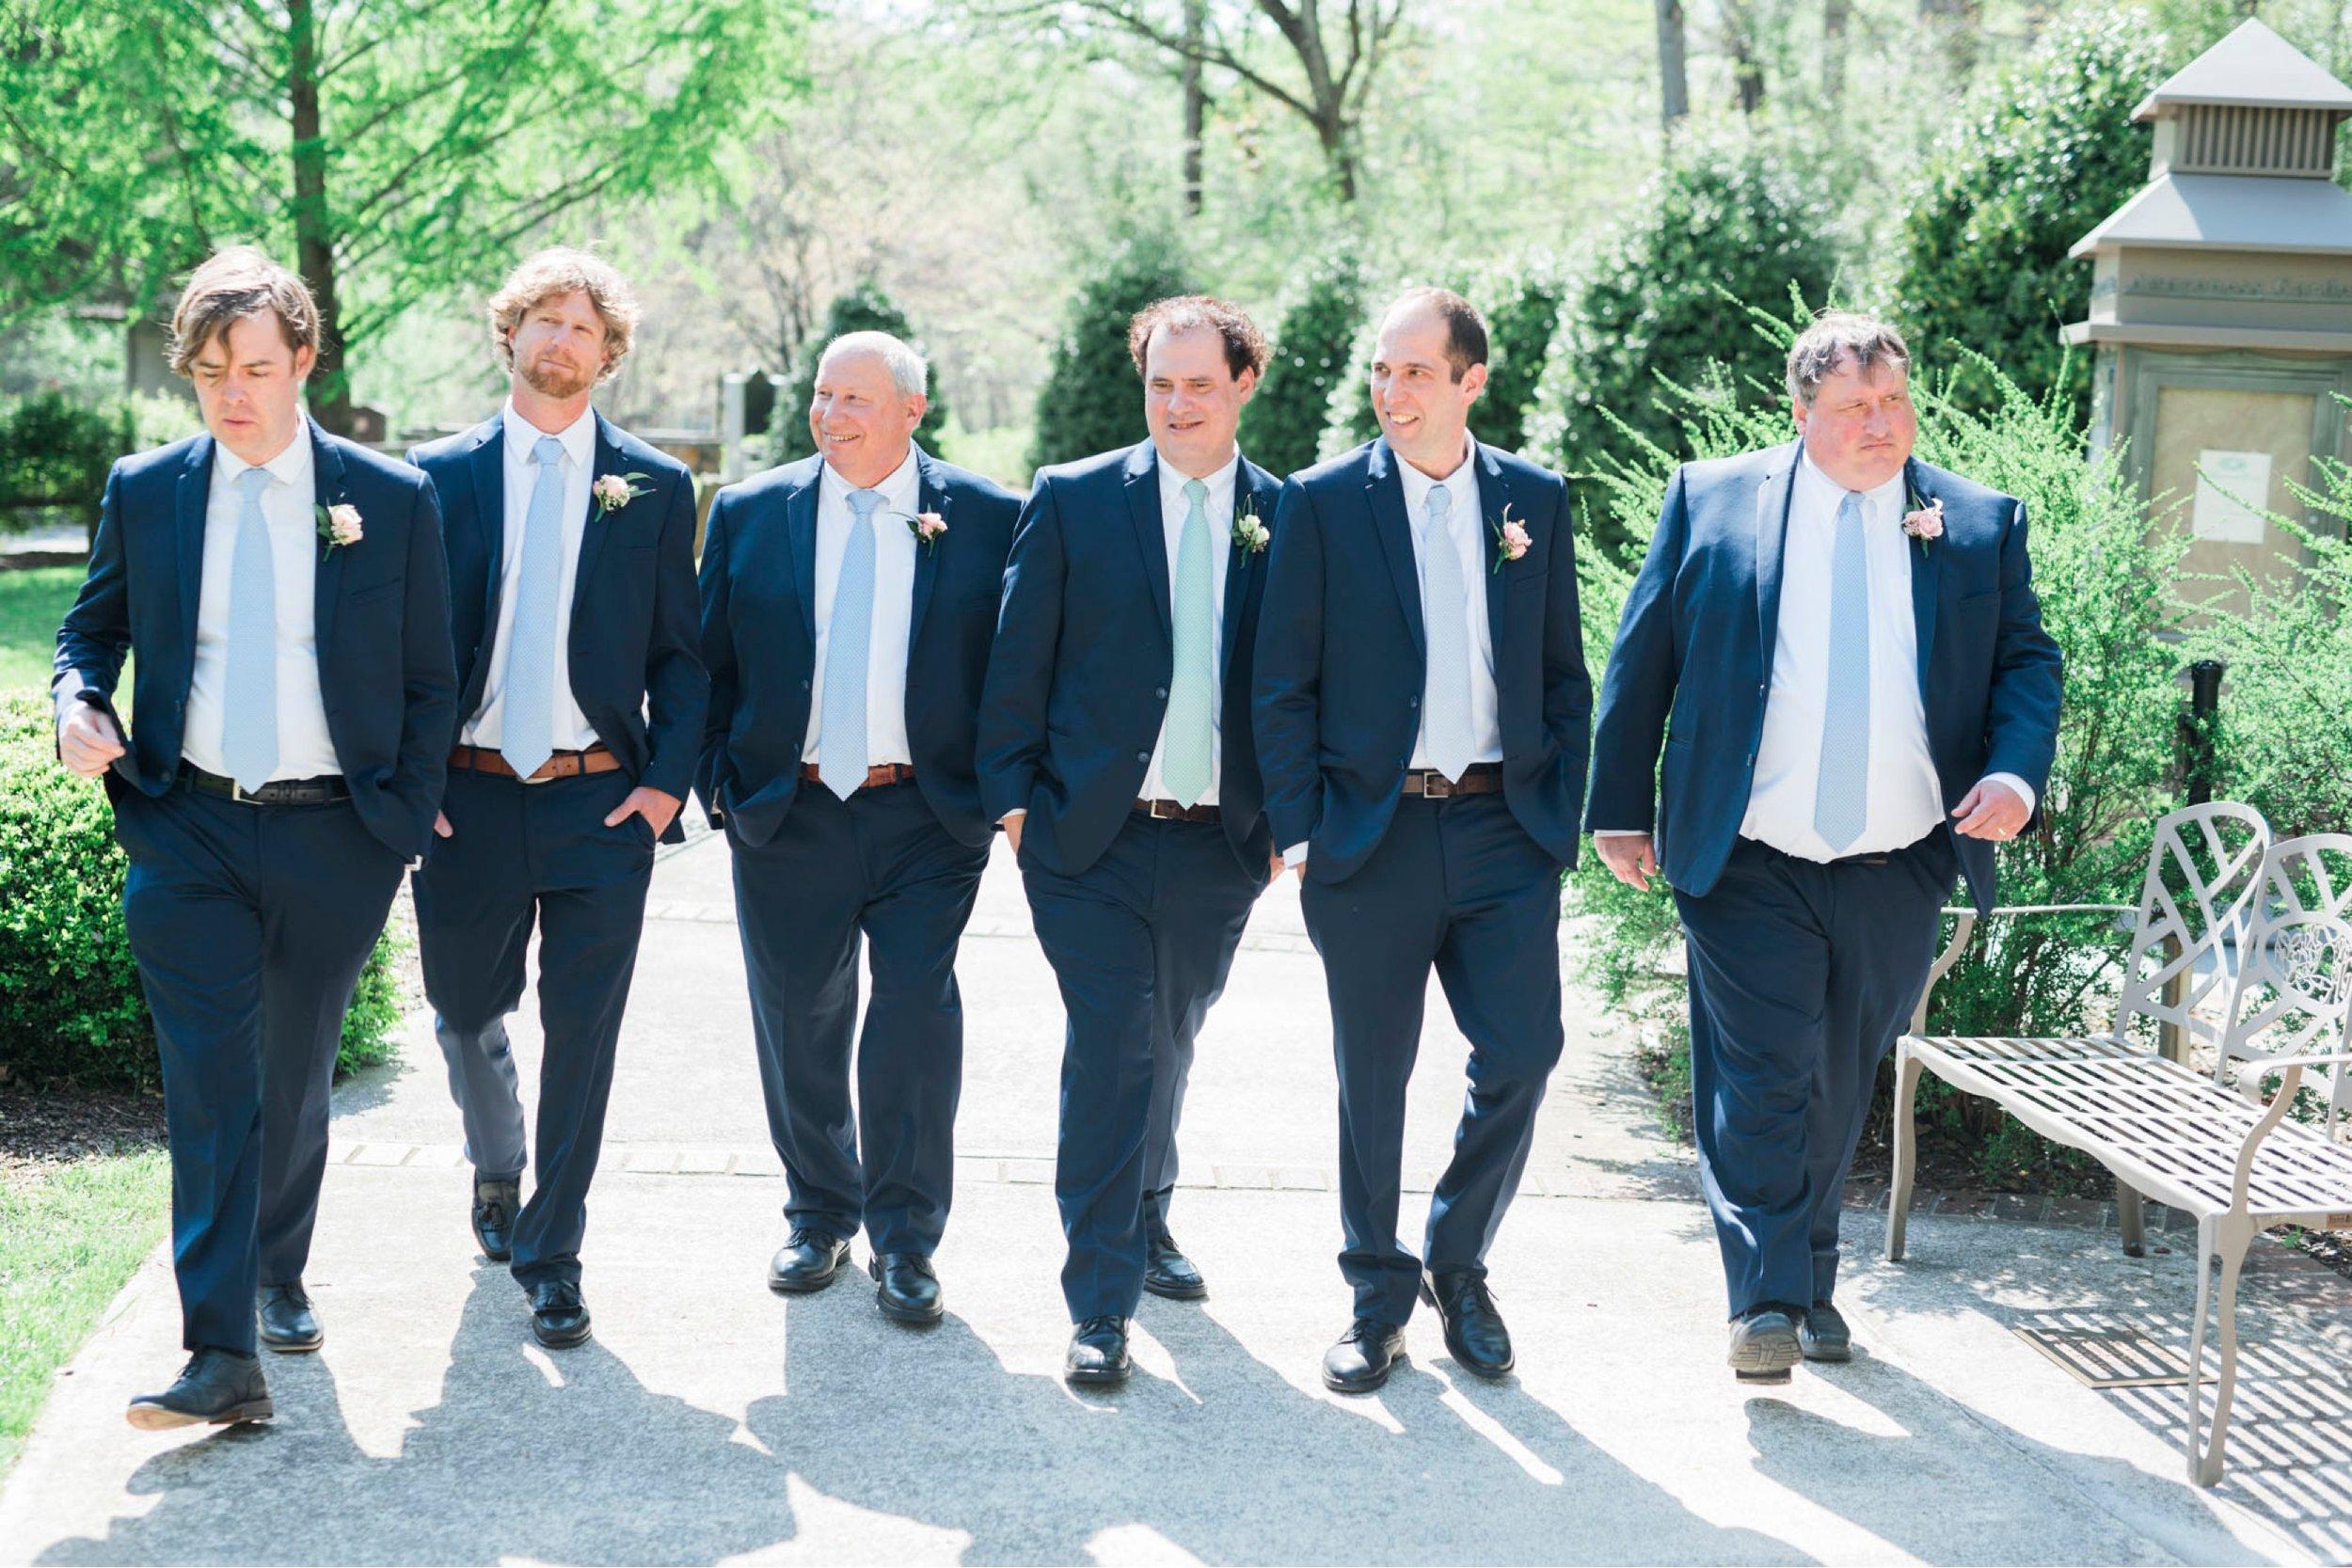 TheVirginianHotel_LynchburgVA_TheVirginianHotelWedding_Virginiaweddingphotographer_Lynchburgvawedding 32.jpg